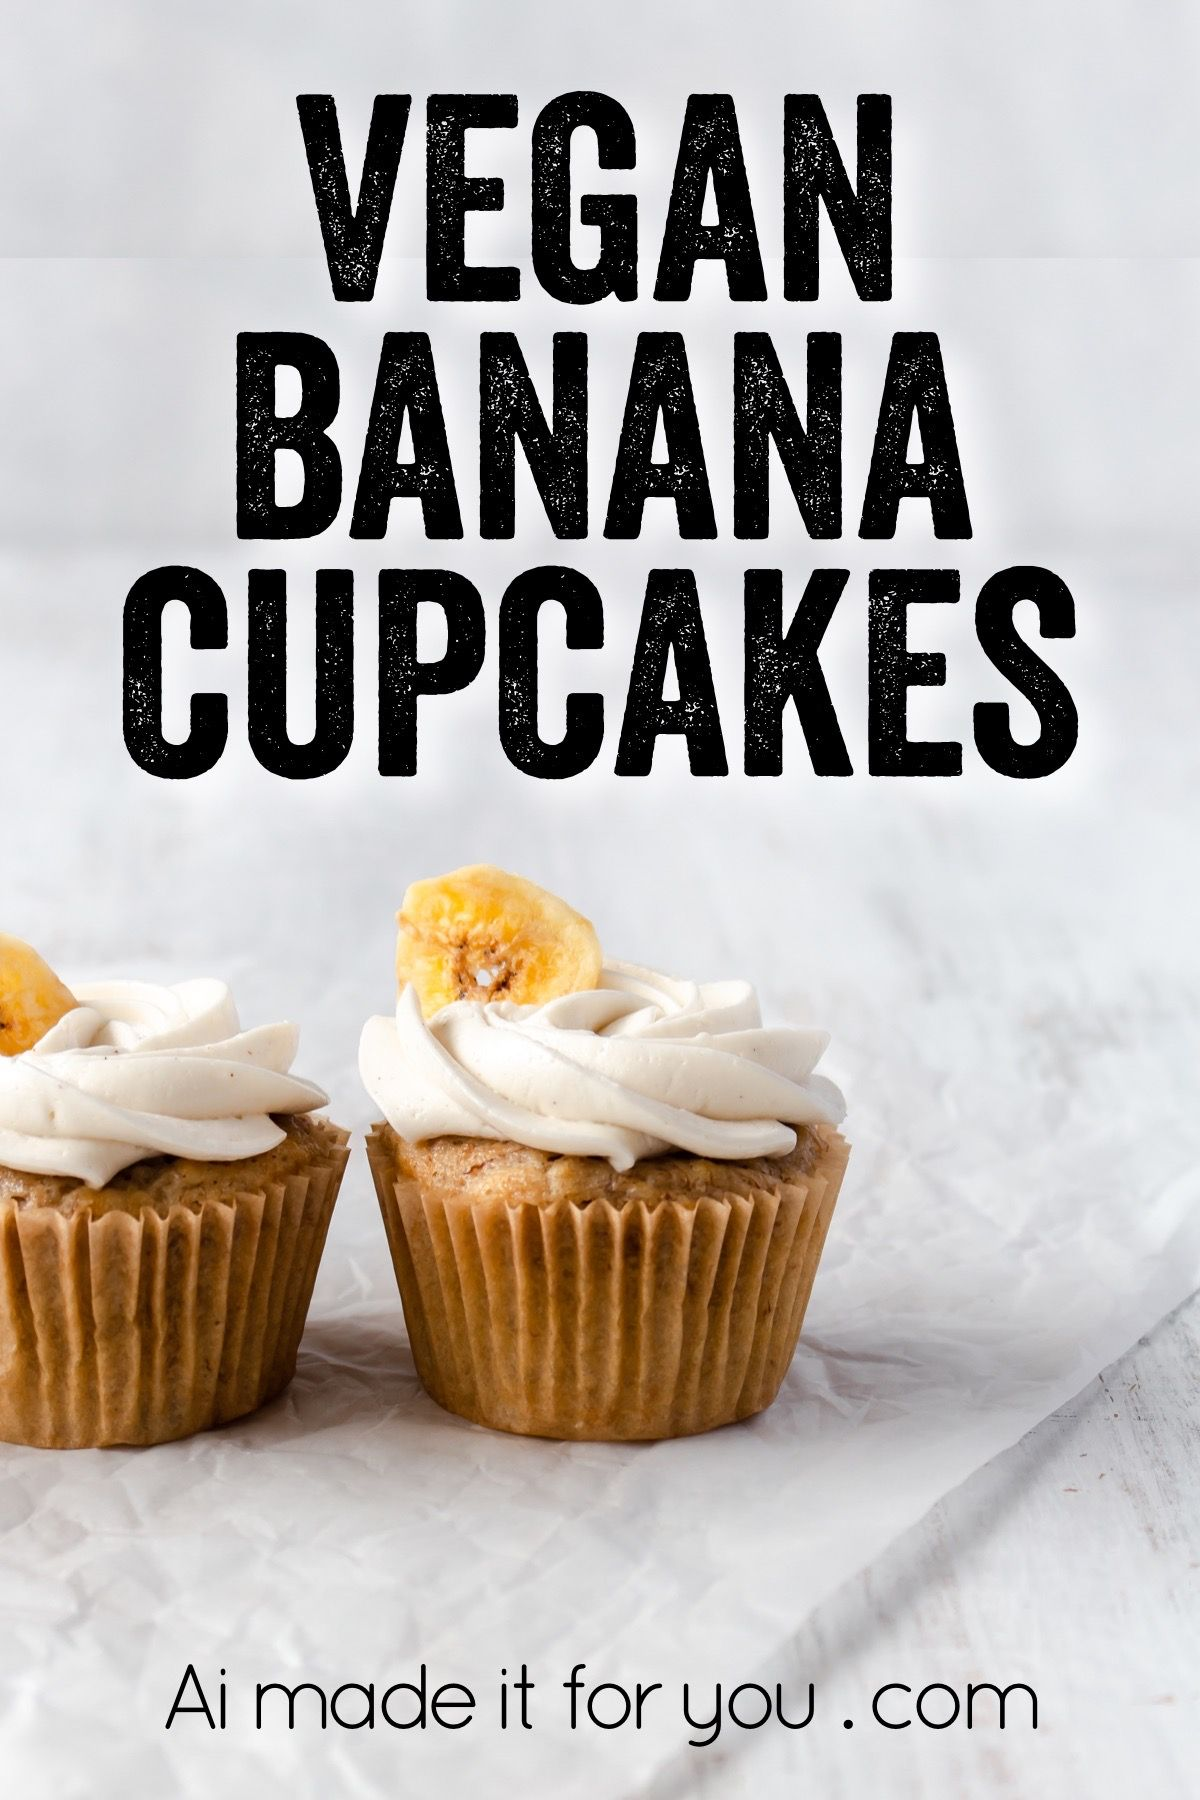 Vegan Banana Cupcakes Easy Fluffy And Moist Ai Made It For You Recipe In 2020 Vegan Baking Recipes Vegan Banana Raw Food Recipes